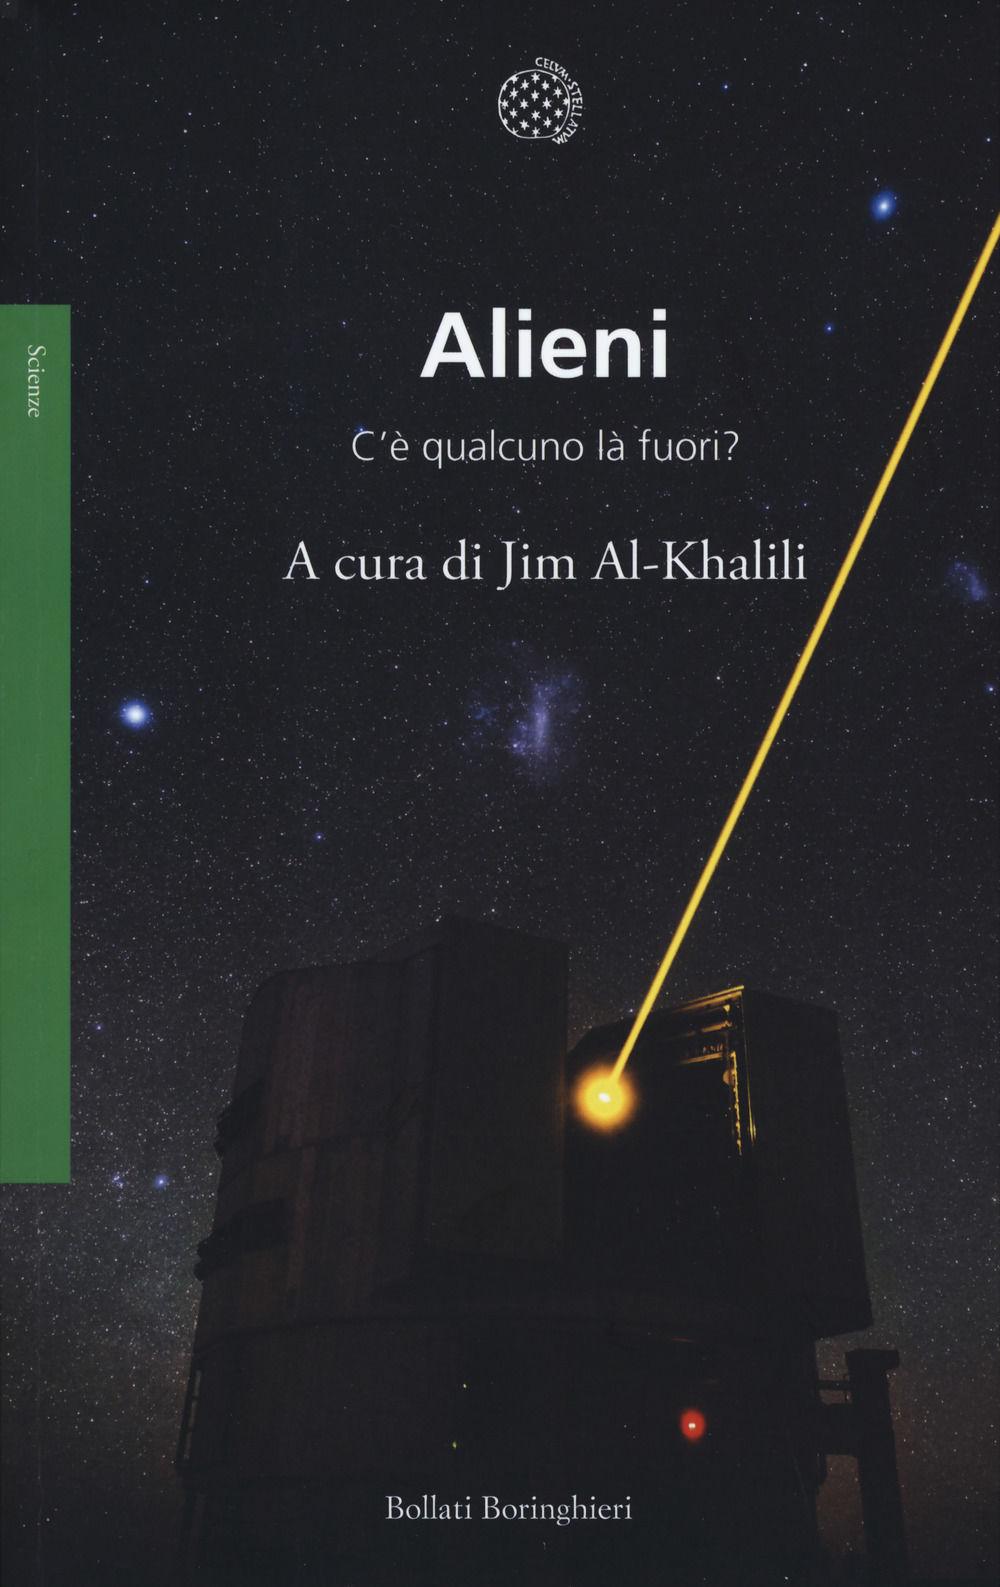 AlieniLibro